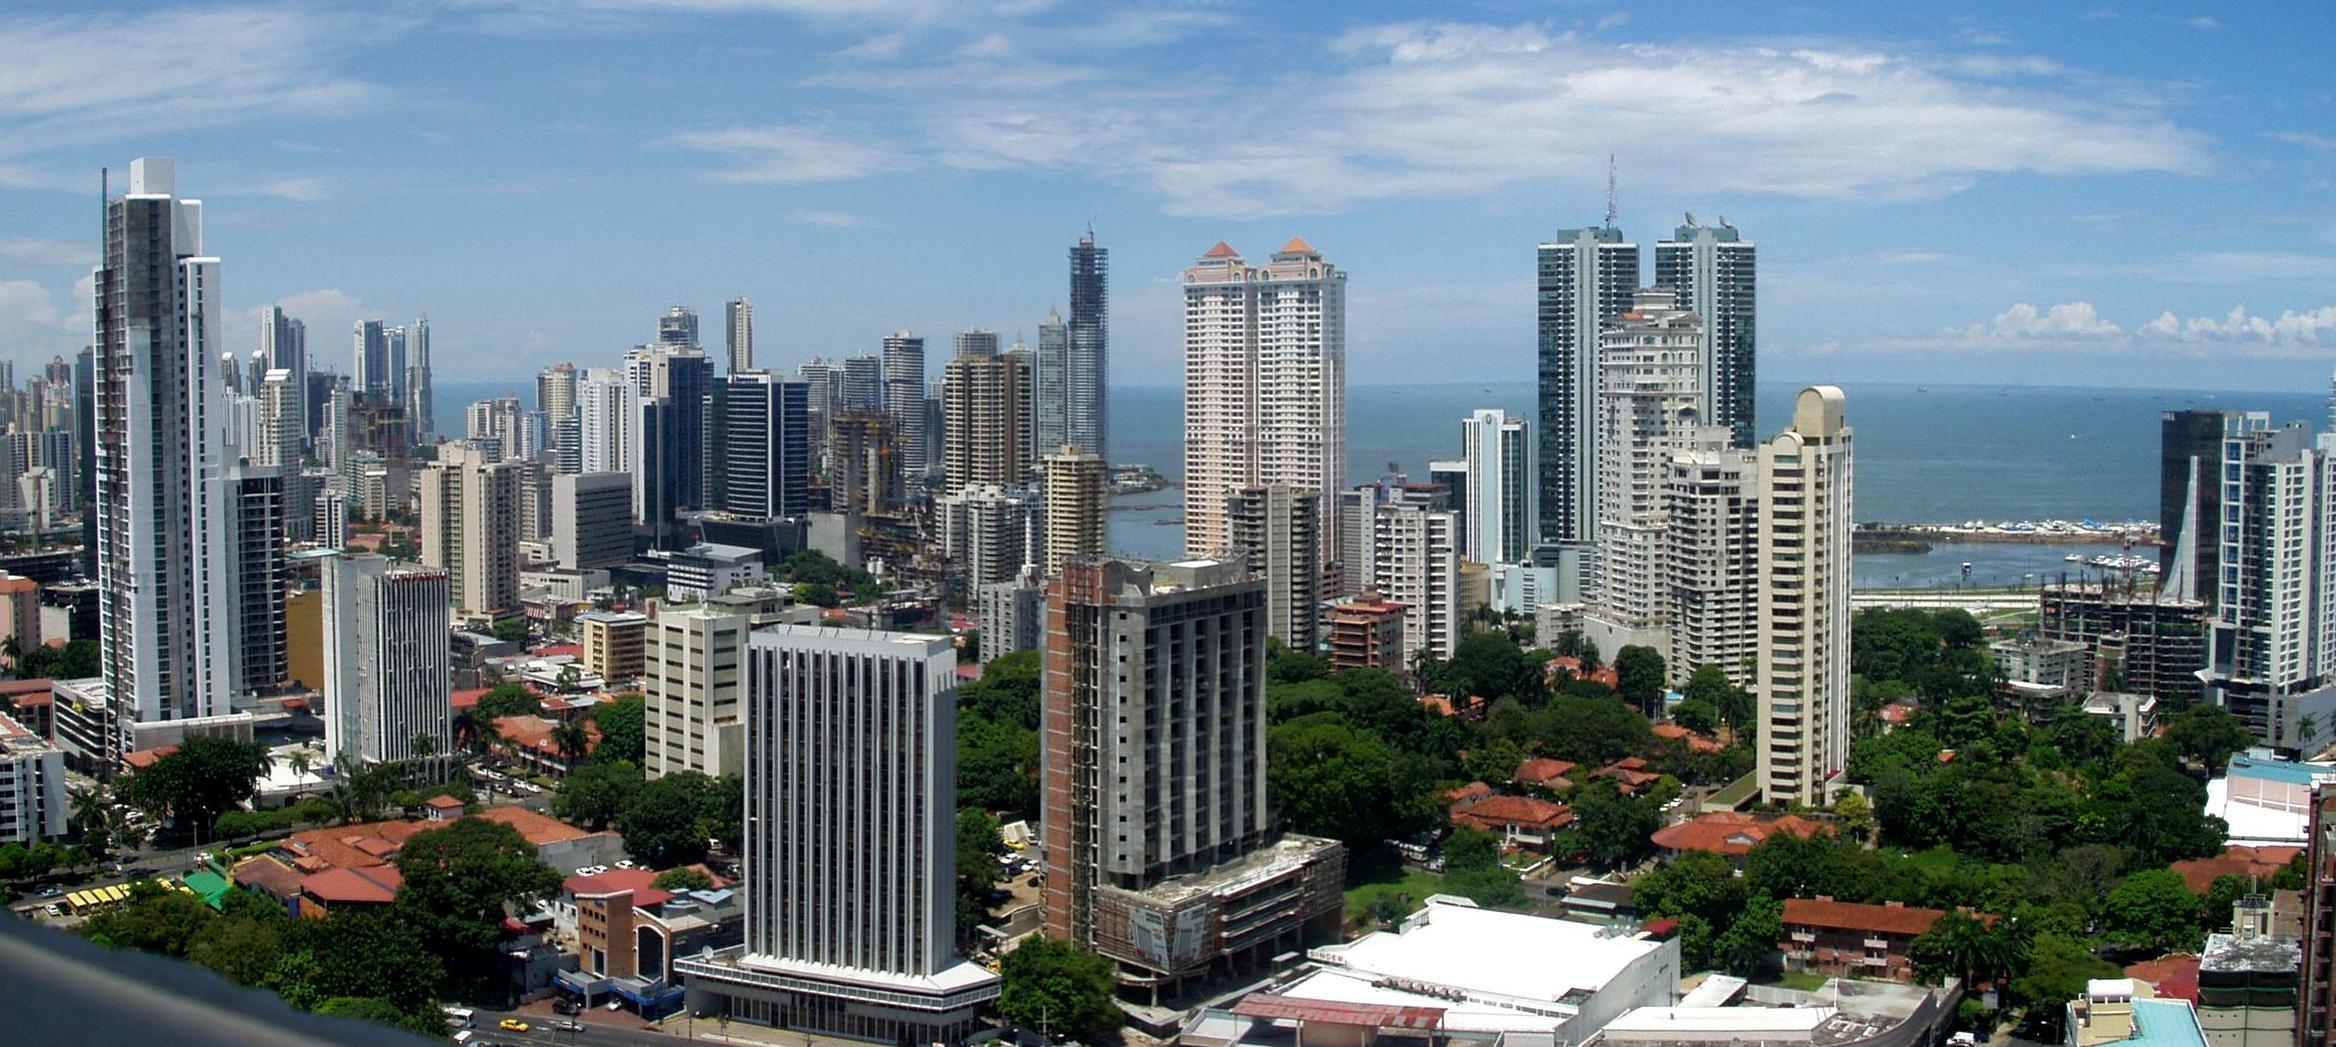 Apartamentos en Venta Panamá – 5 Factores a Considerar Antes de Comprar